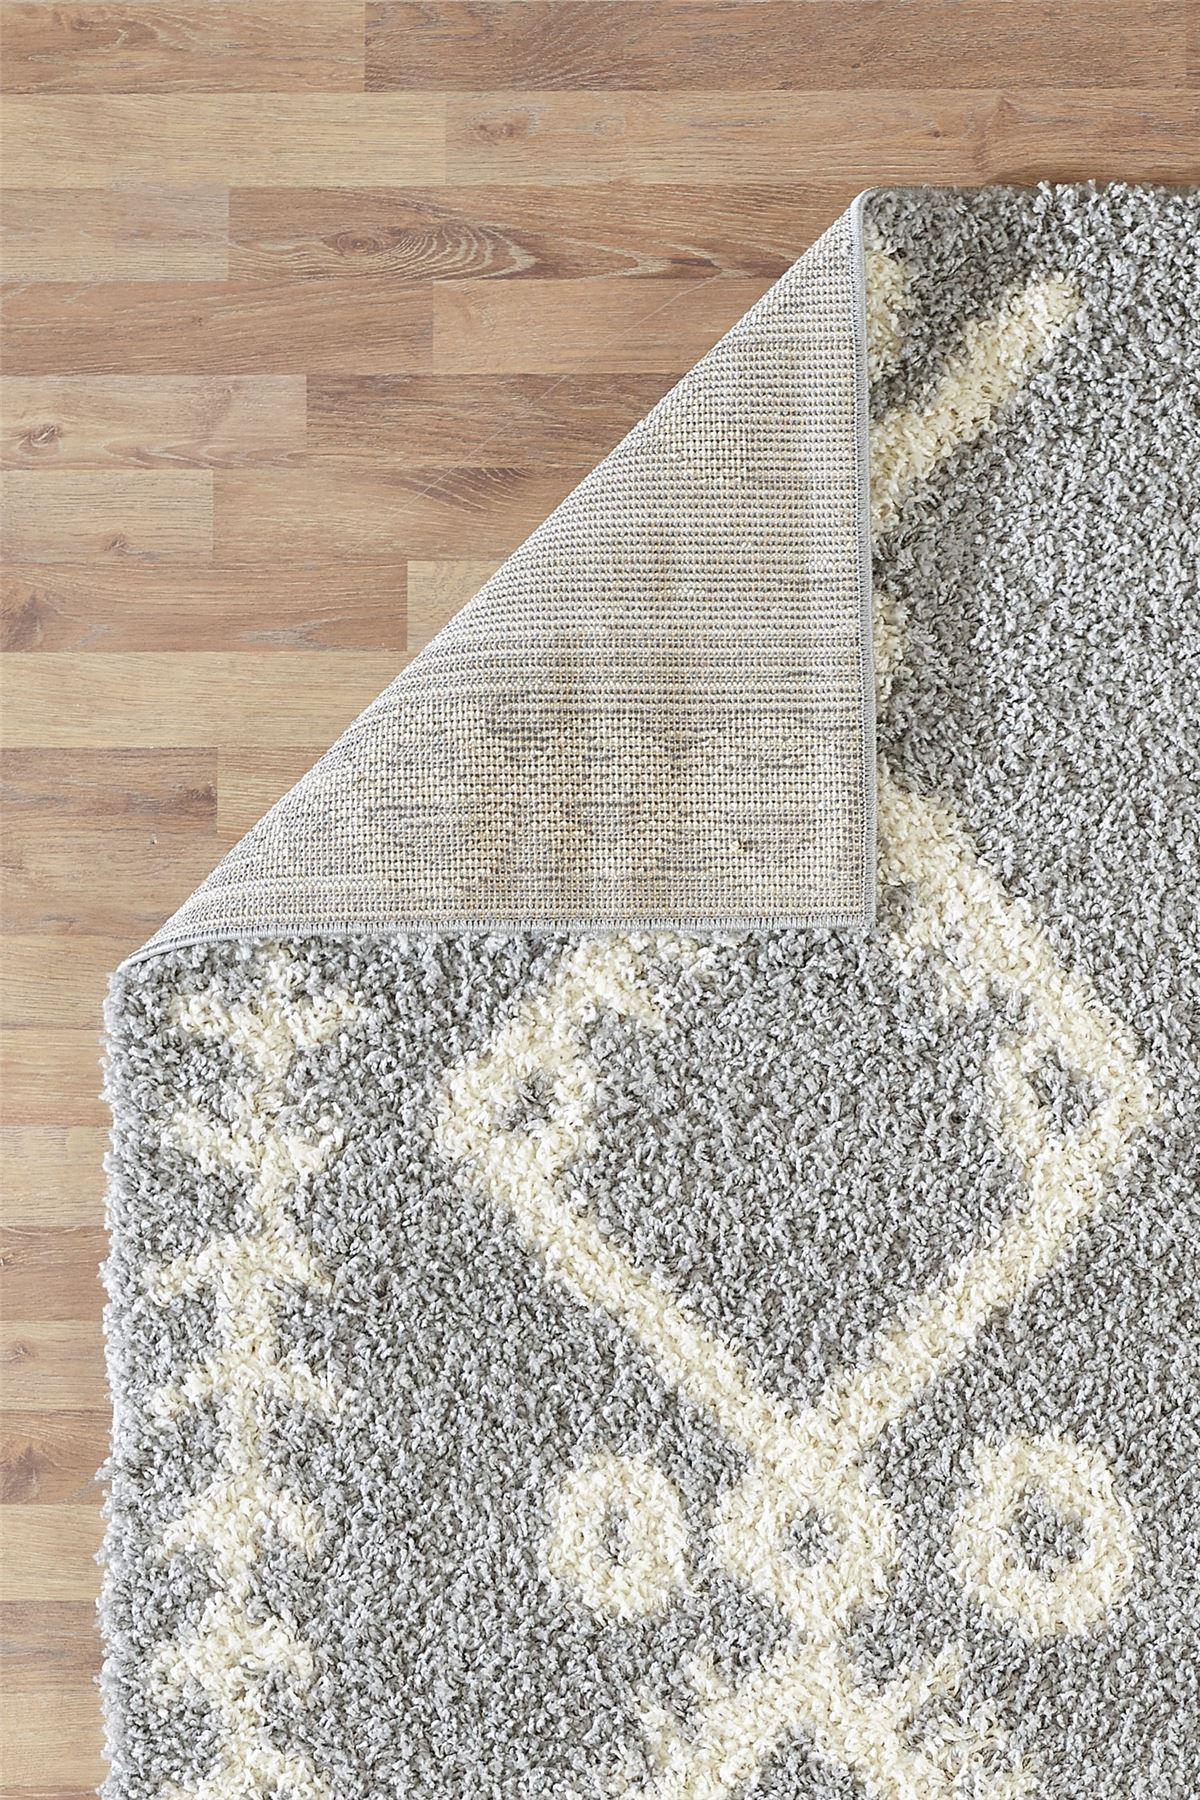 Moroccan-Shaggy-Area-Rug-Grey-White-Black-Soft-Carpet-Traditional-Berber-Designs thumbnail 28